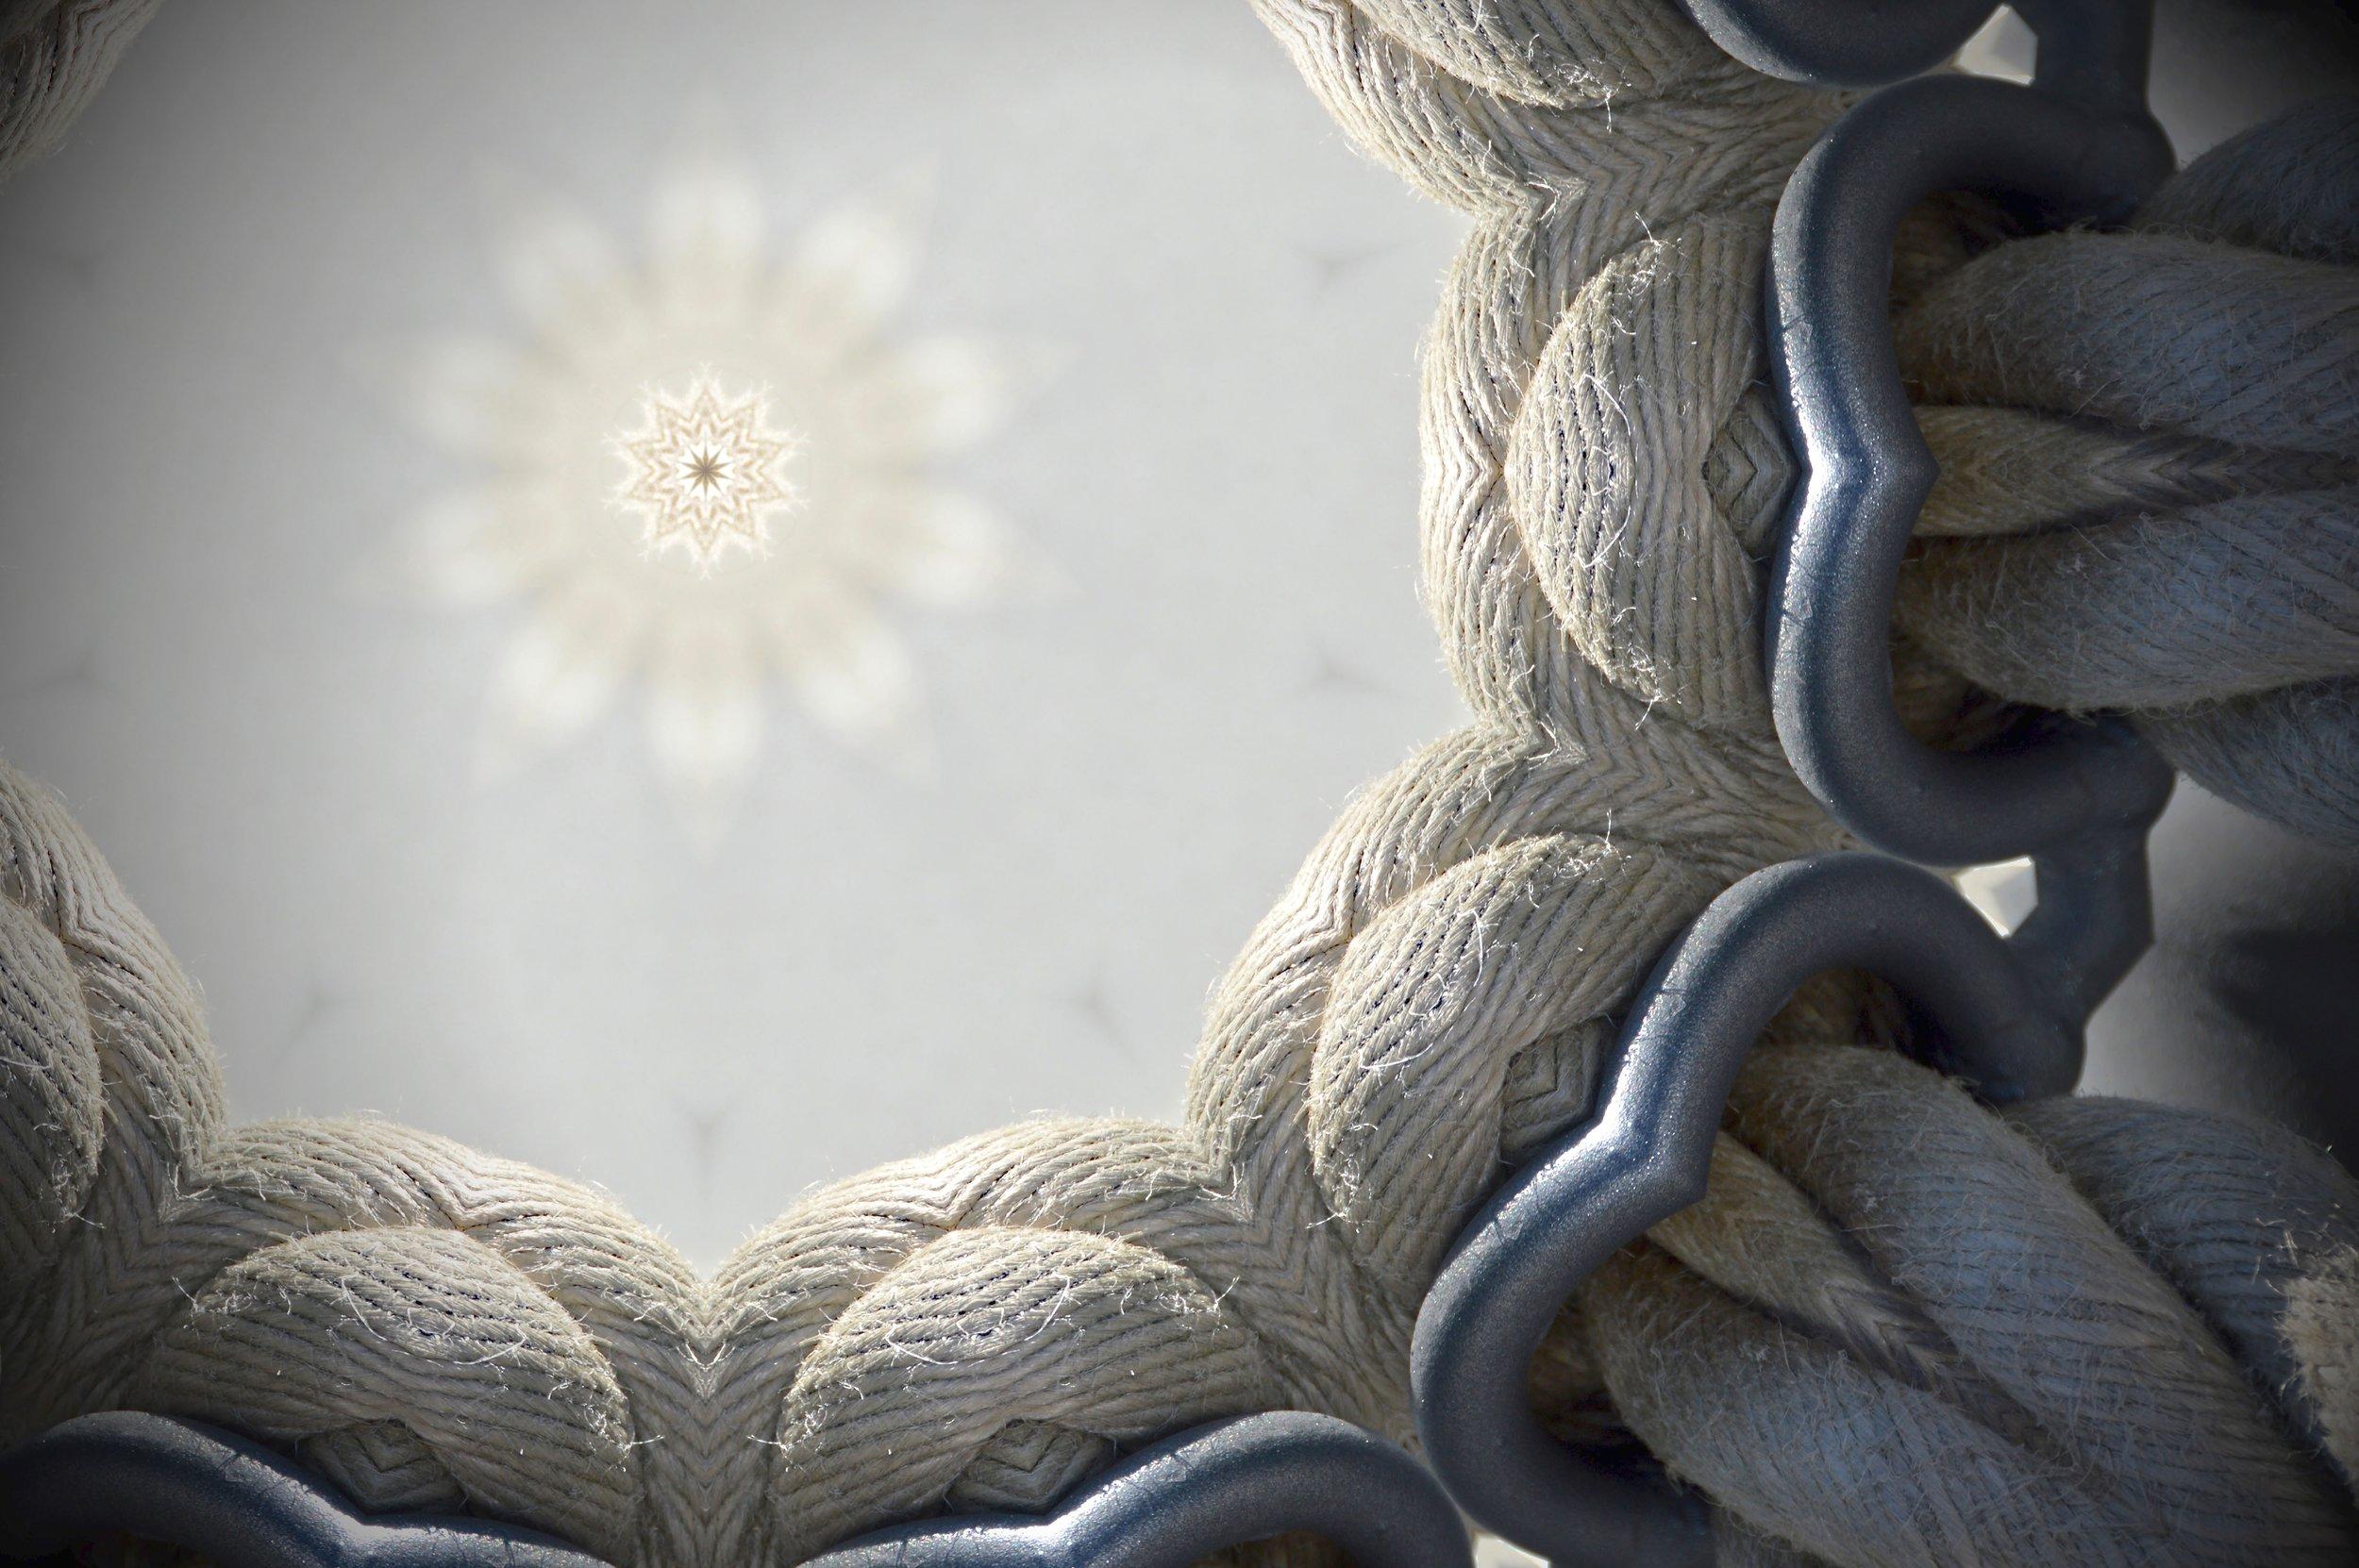 kaleidoscope design-pattern-texture-structure-159076.jpeg